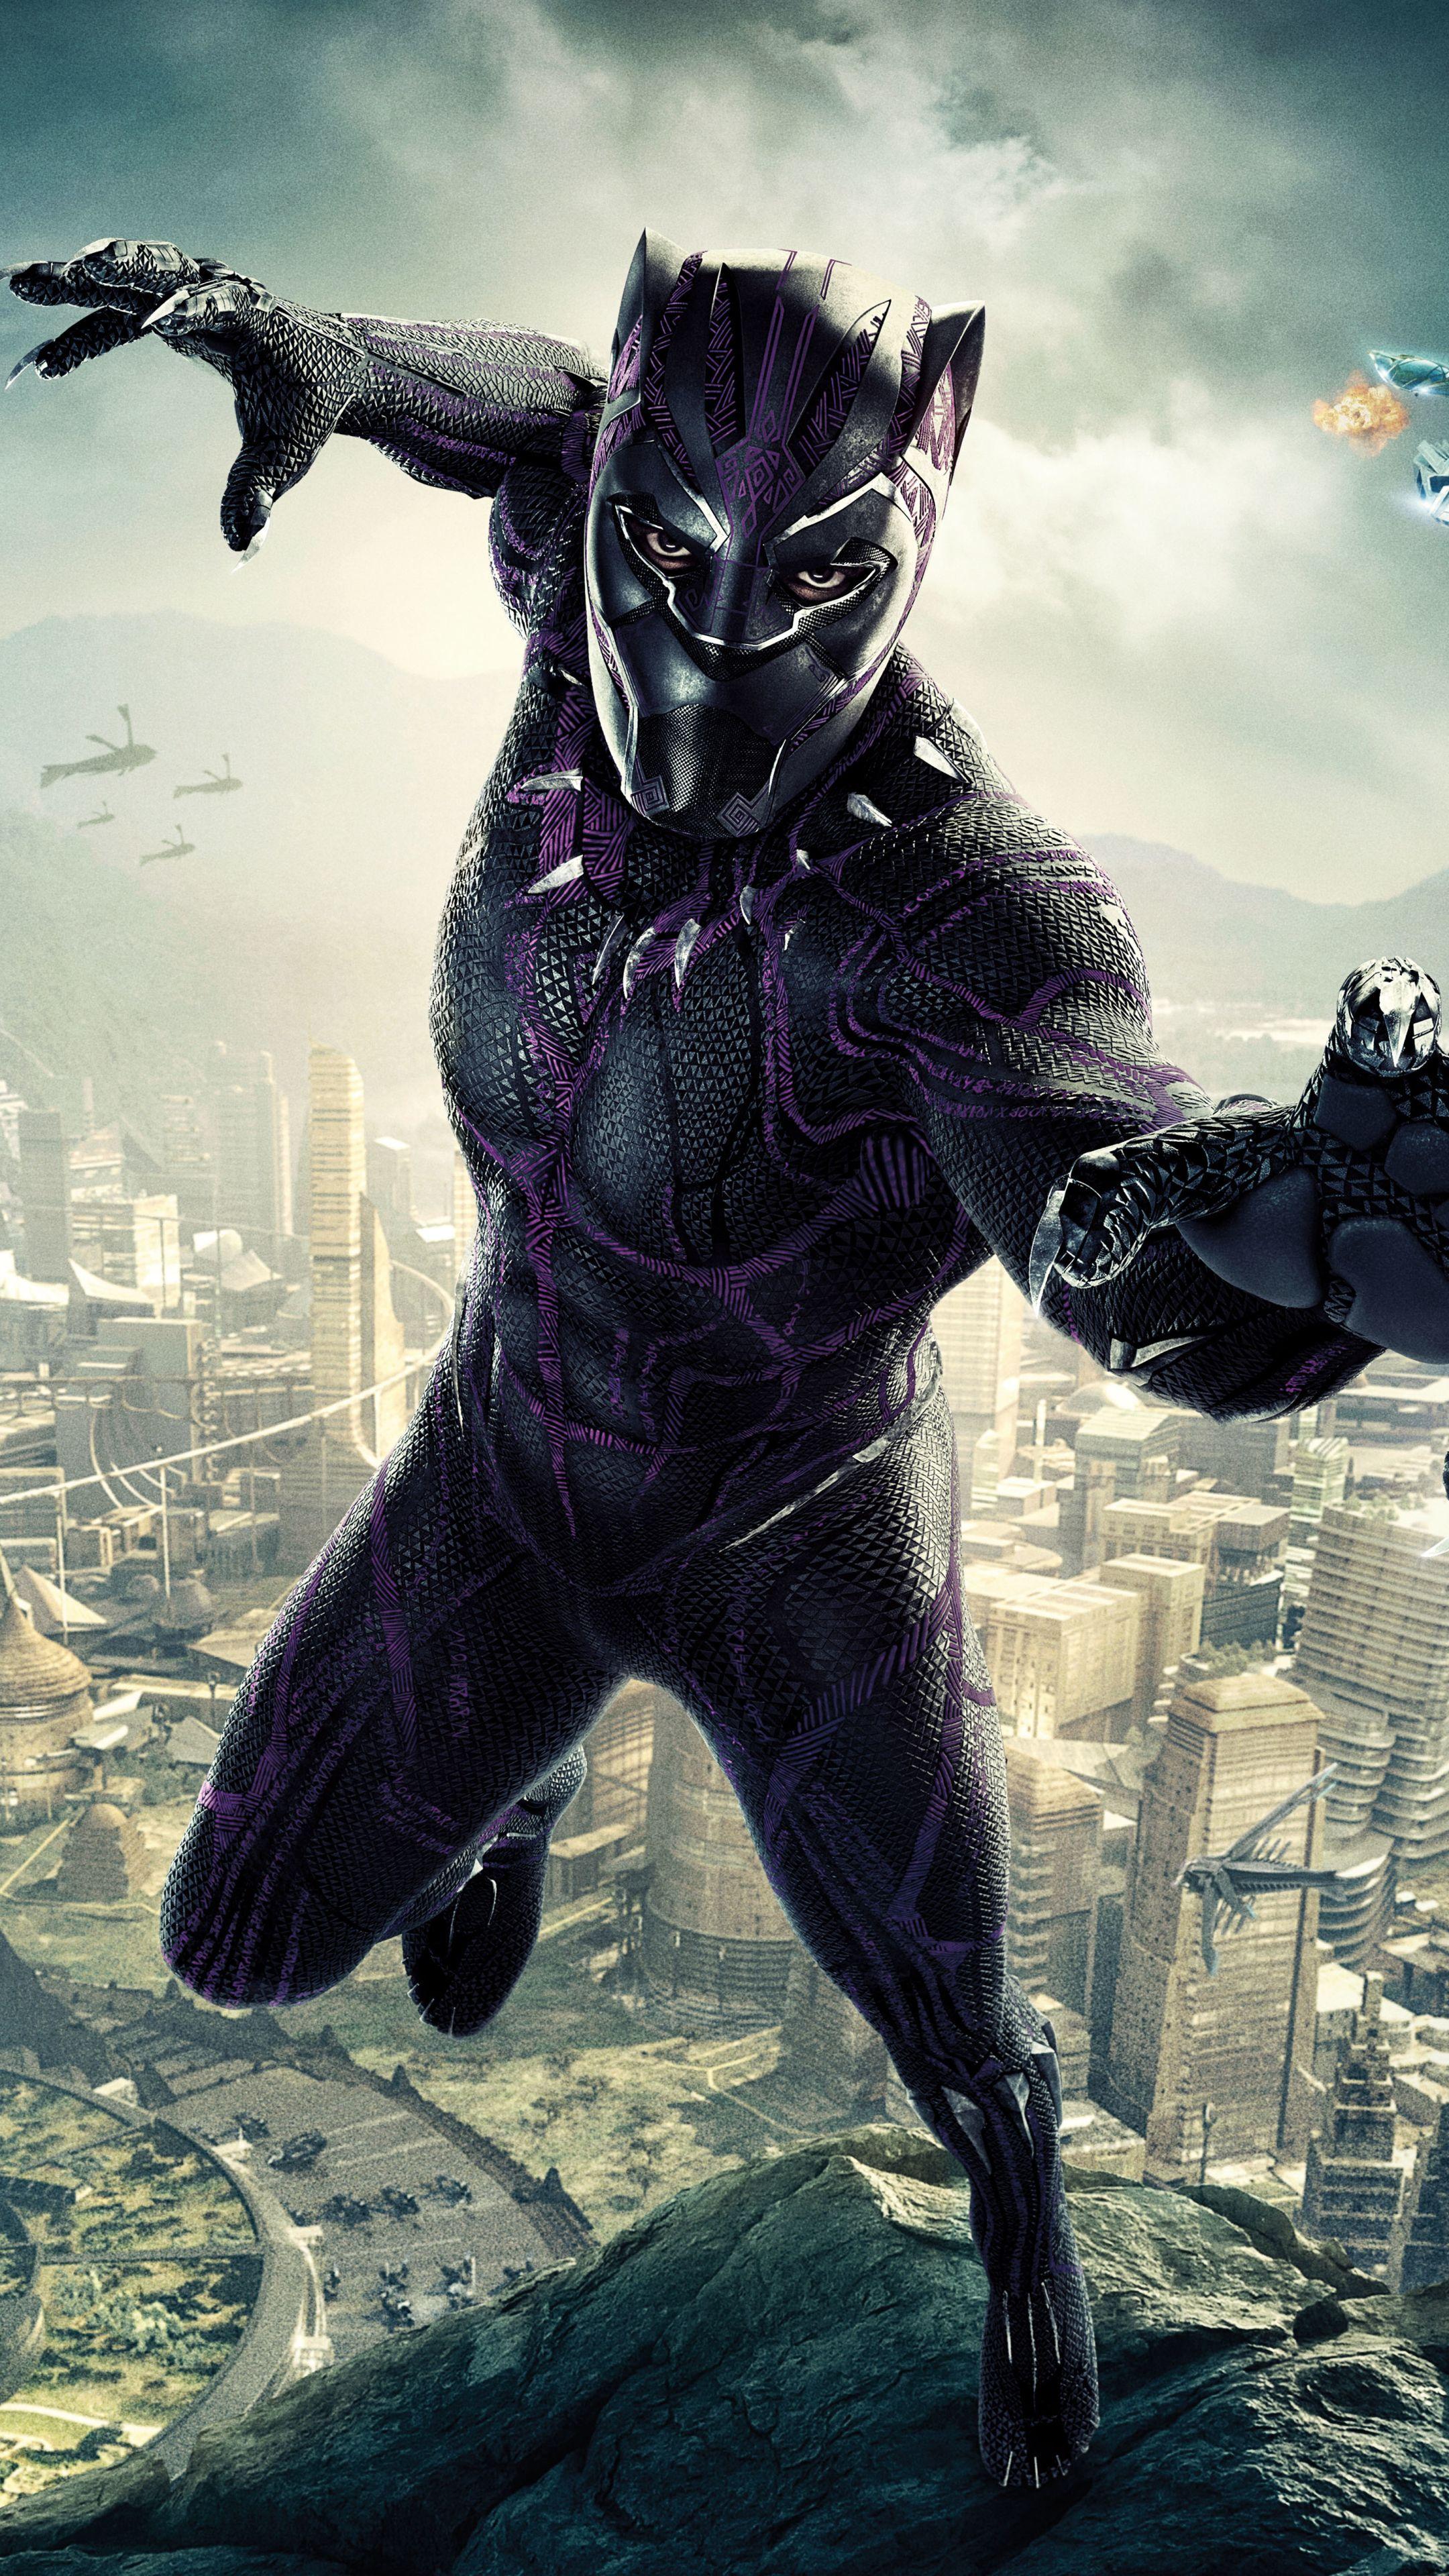 Black Panther Wallpaper 4k Iphone 3d Wallpapers Black Panther Hd Wallpaper Black Panther Images Black Panther Superhero